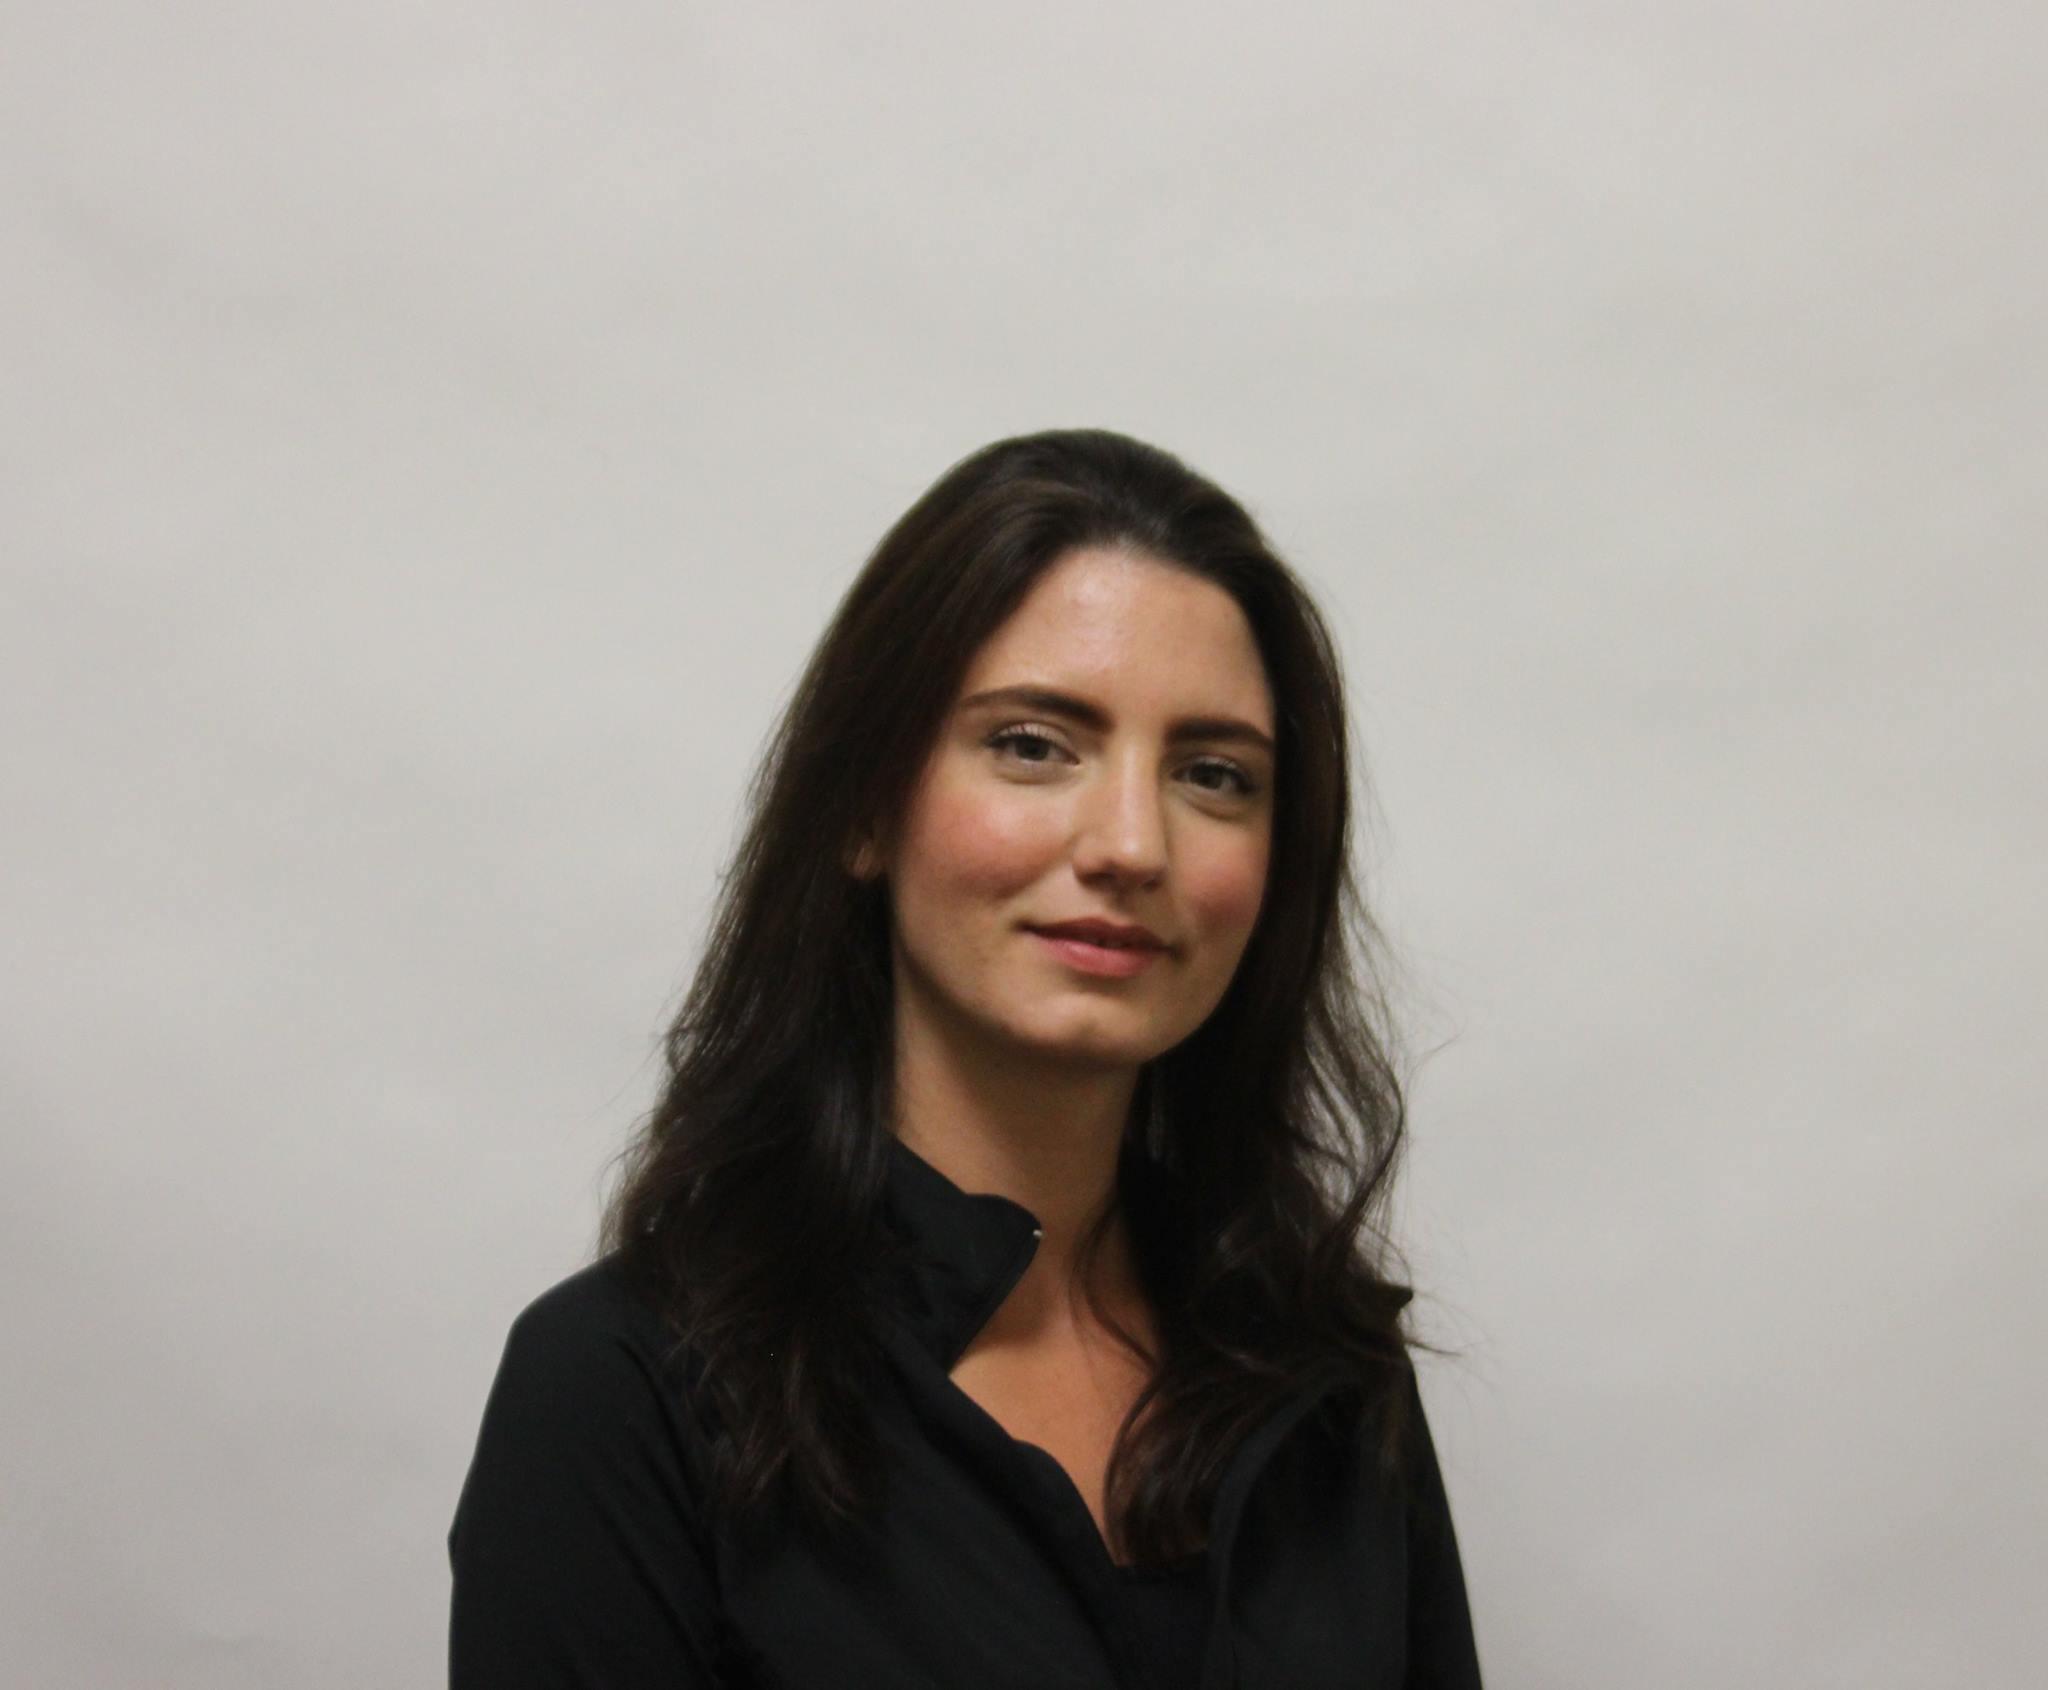 Andrea Cavanagh